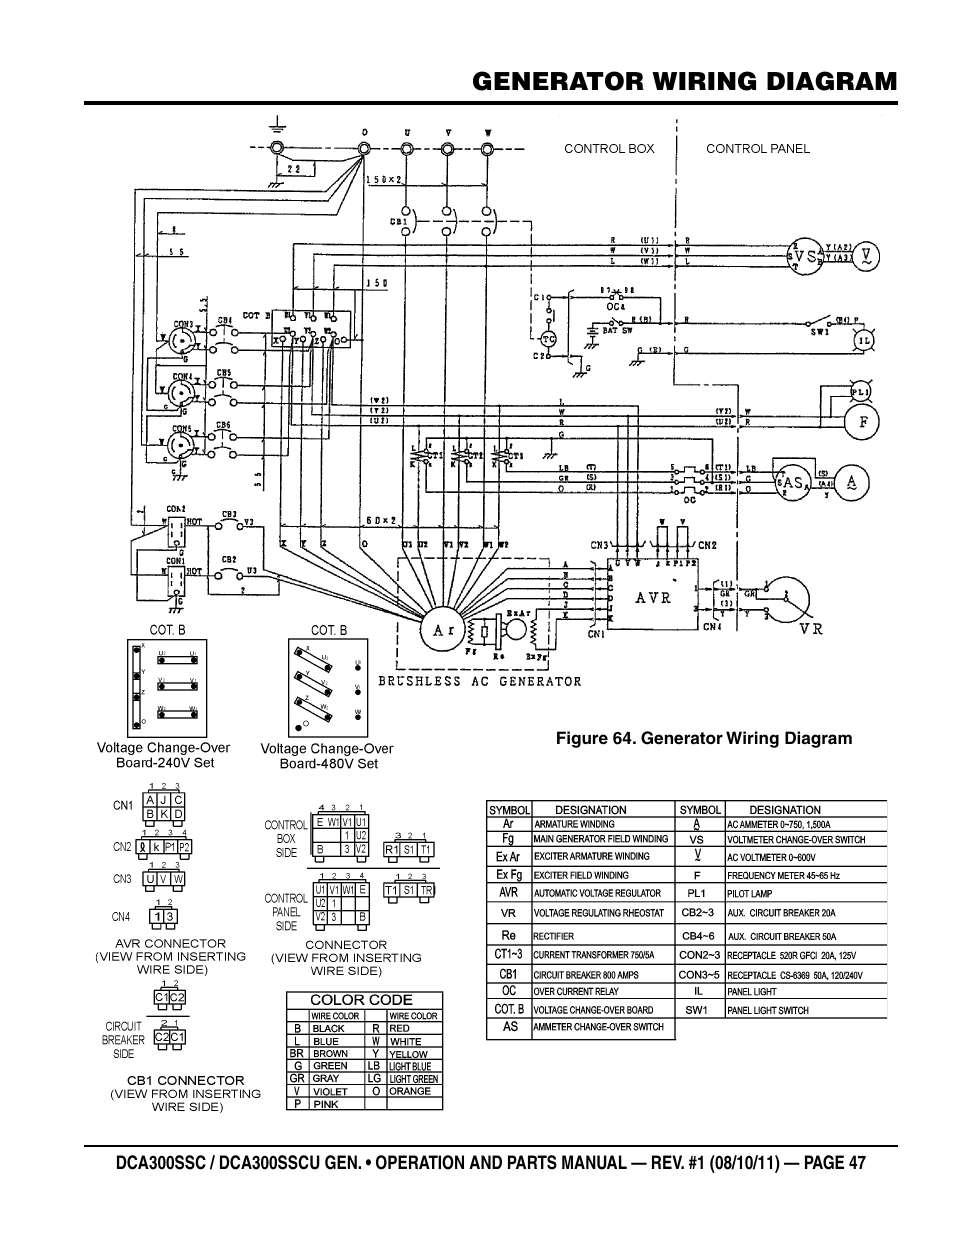 medium resolution of generator wiring diagram multiquip whisperwatt series 60hz generator cummins qsl9 g3 diesel engine